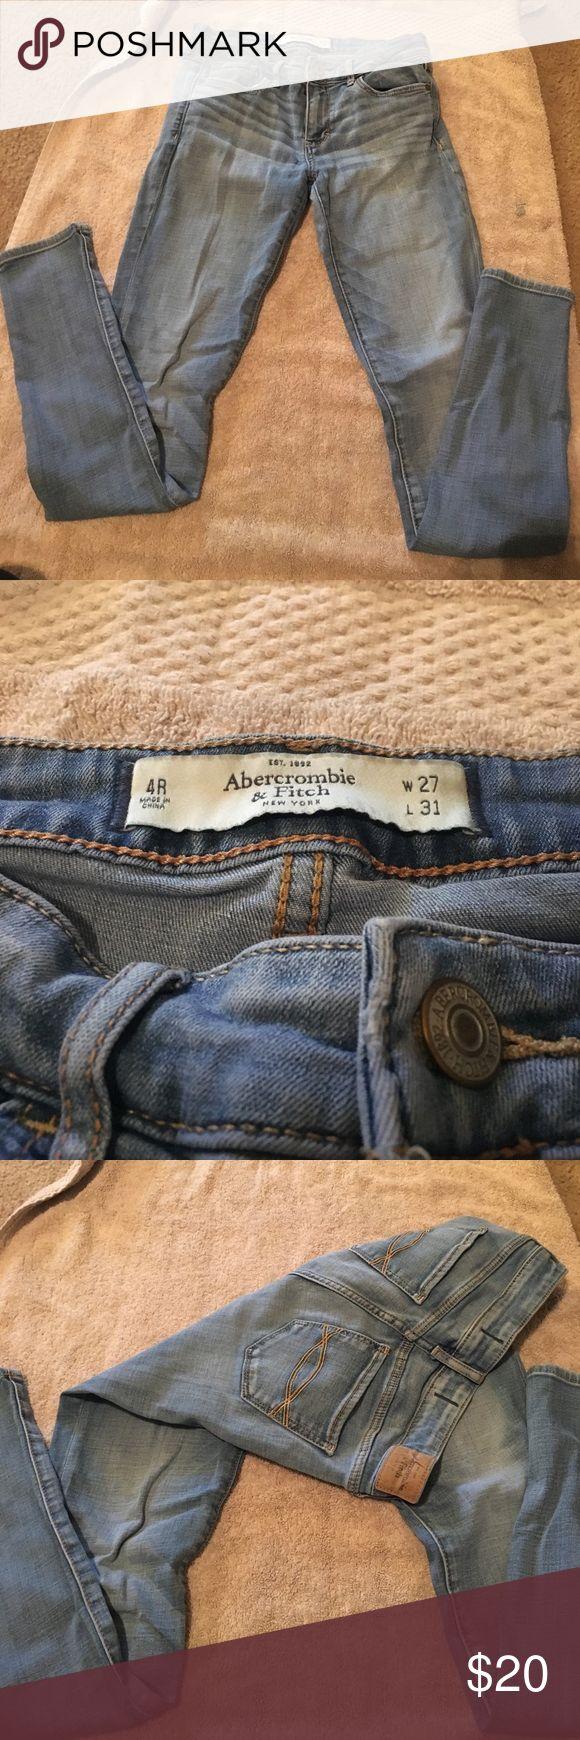 Abercrombie & Fitch skinny jeans Abercrombie & Fitch skinny jeans Abercrombie & Fitch Jeans Skinny